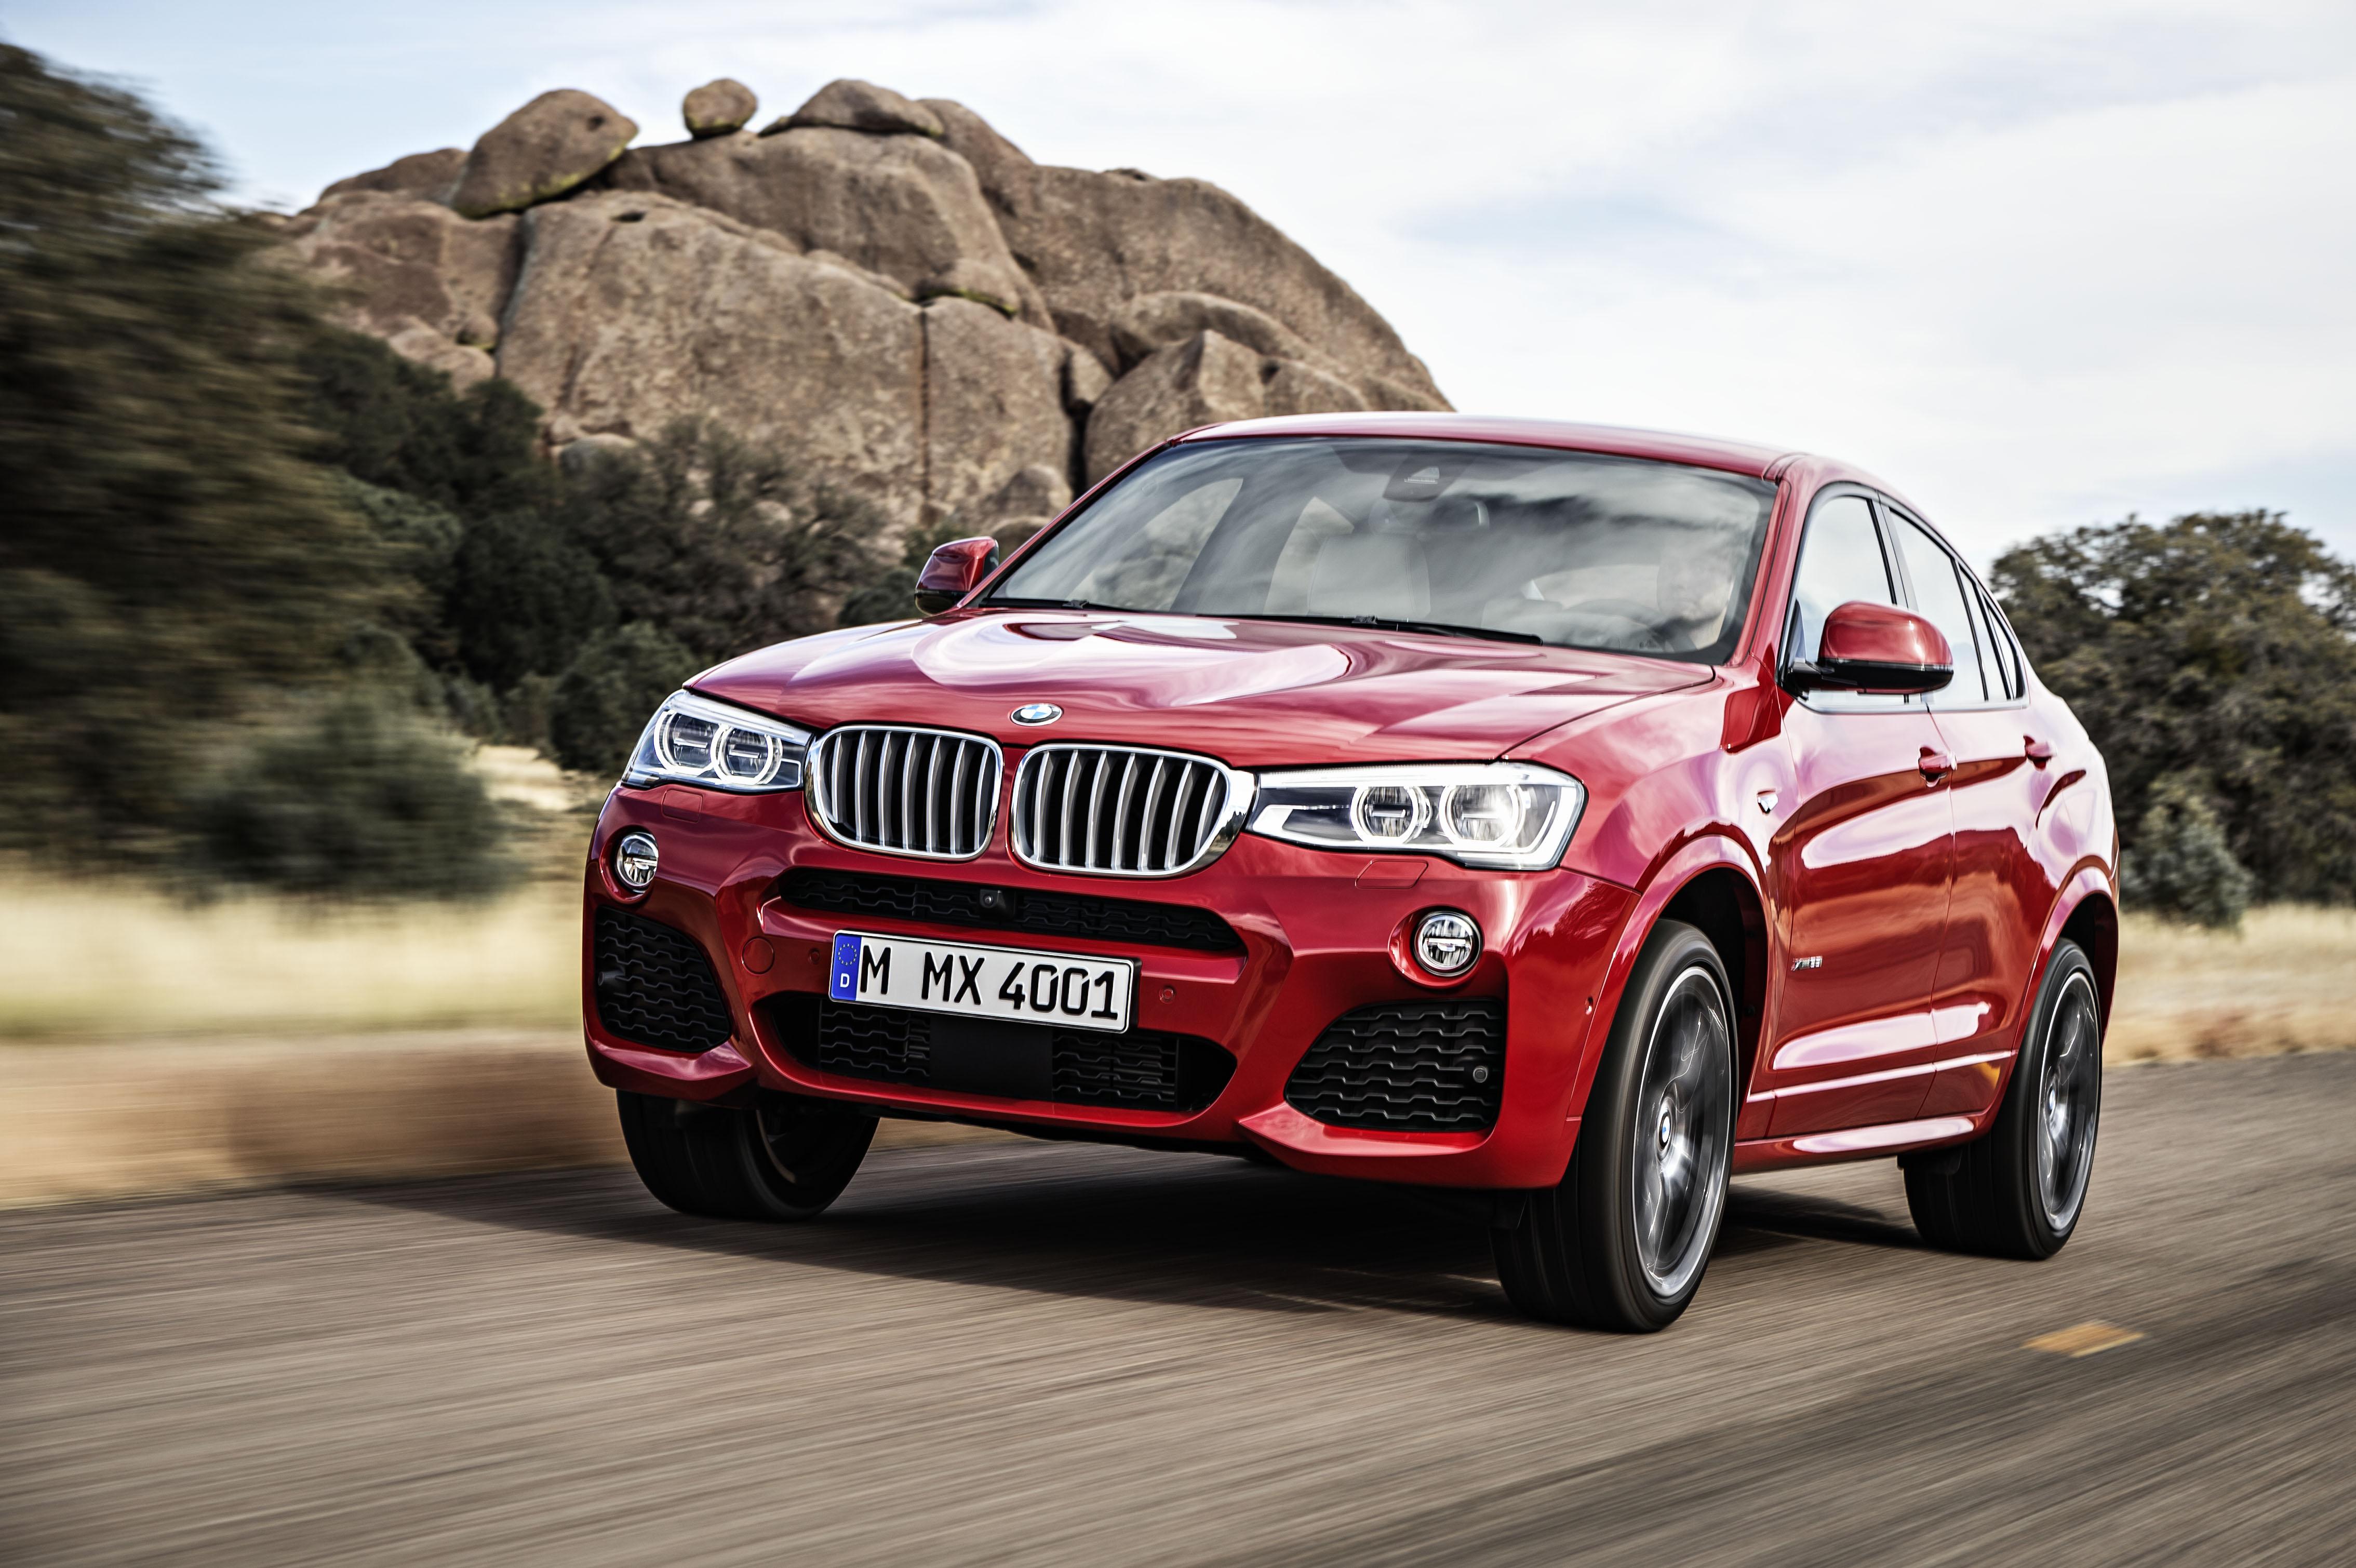 2014 BMW X4 ( F26 ) #408881 - Best quality free high ...